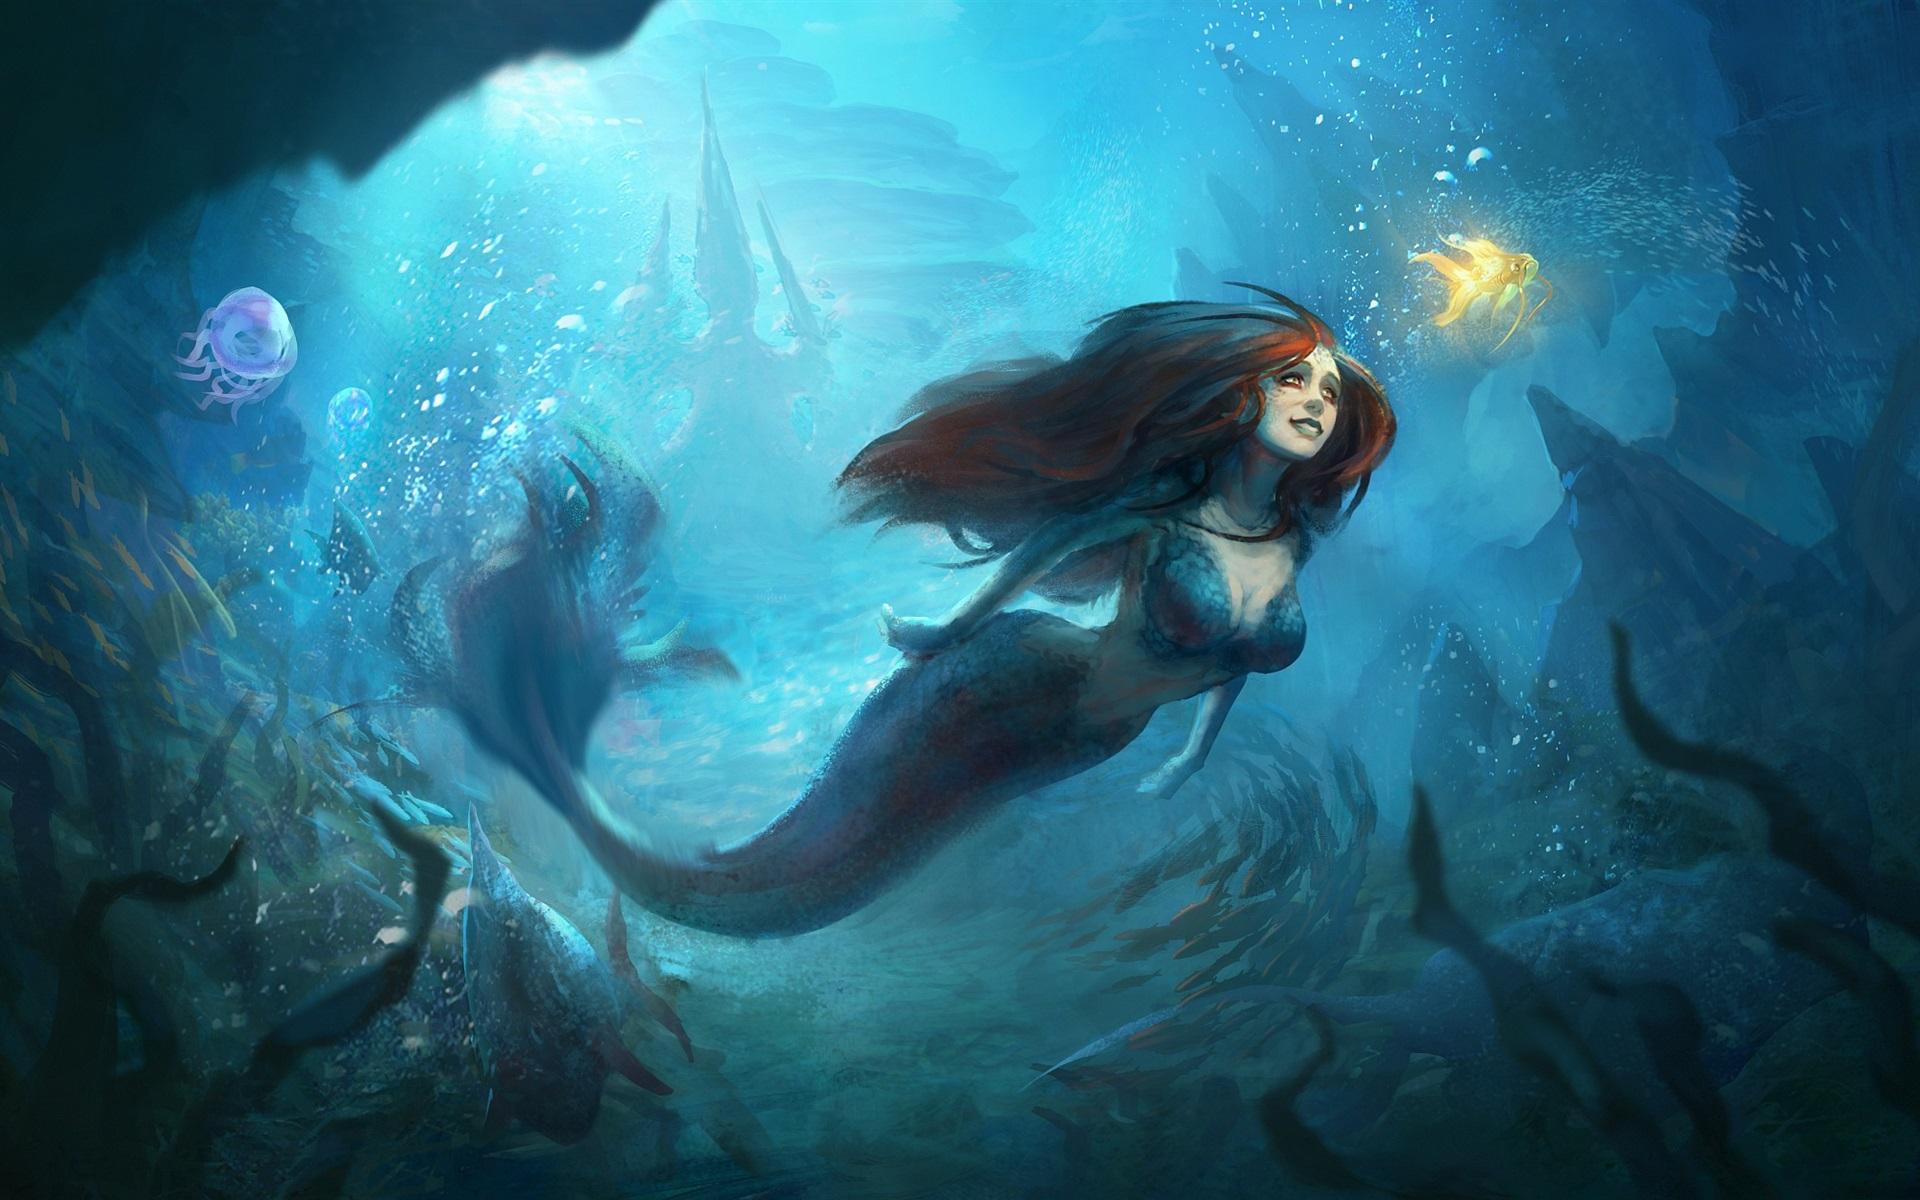 wallpaper beautiful mermaid underwater goldfish art